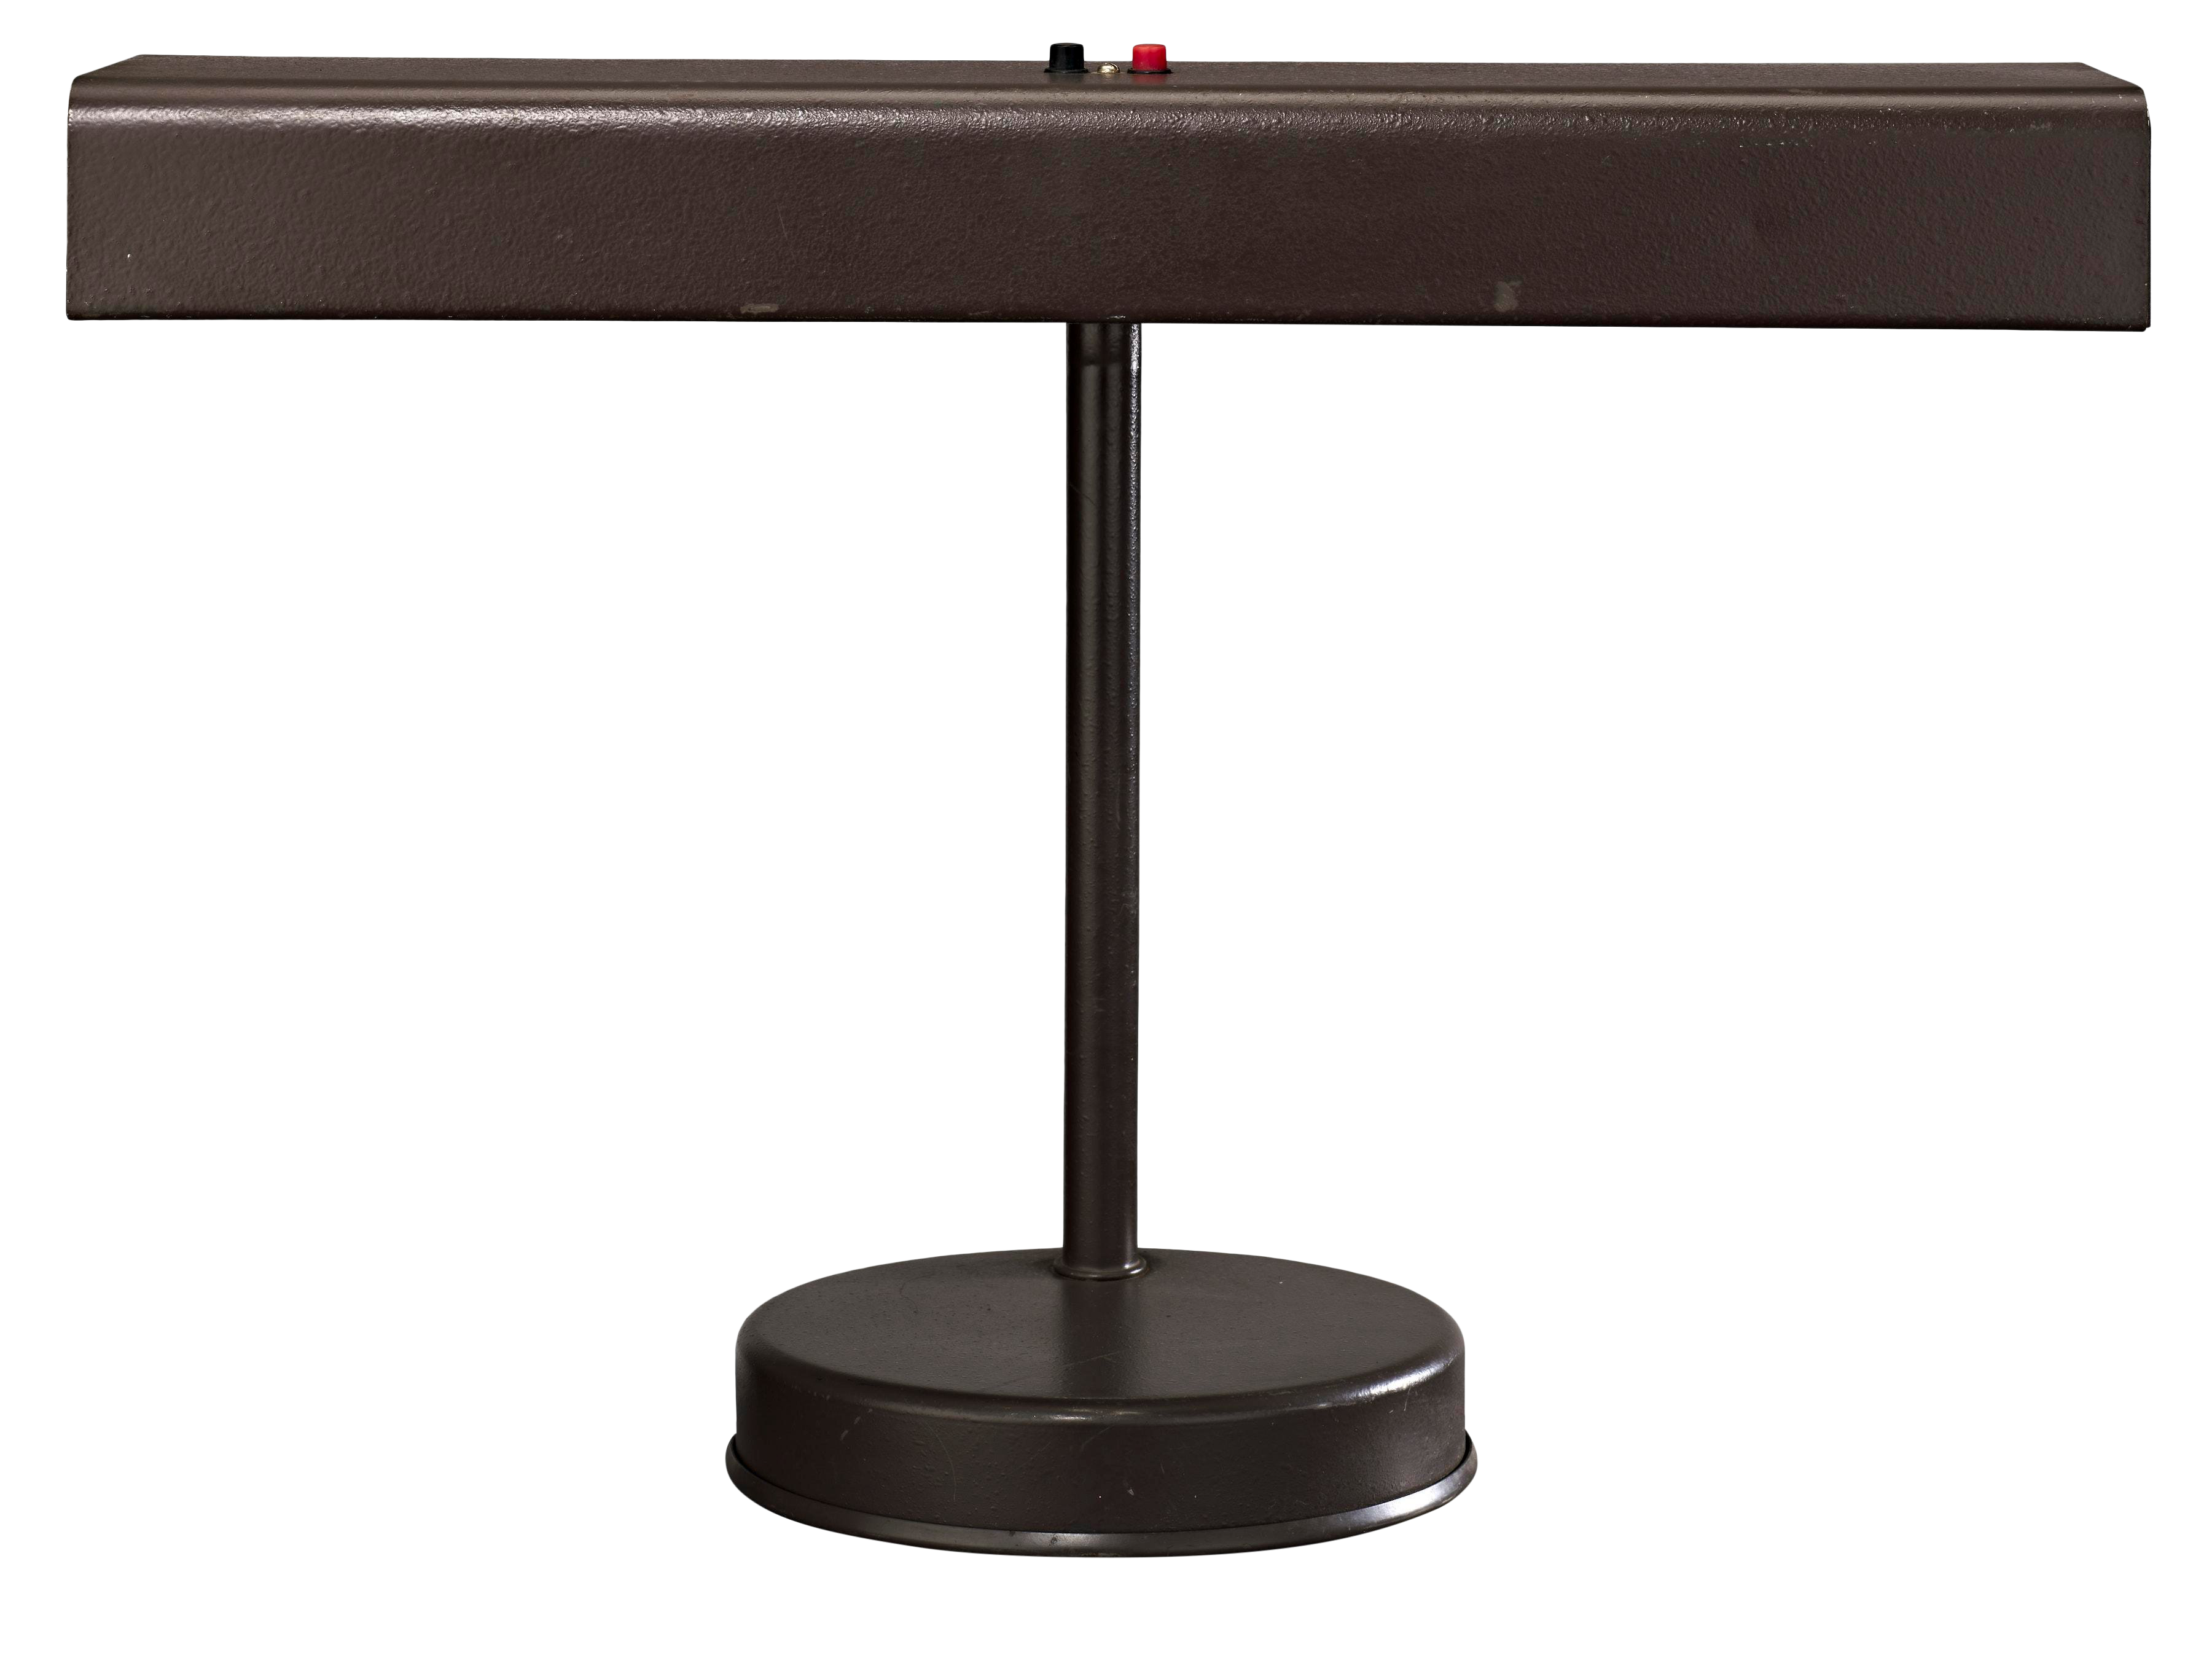 Image of: Vintage Mid Century Industrial Desk Lamp Chairish